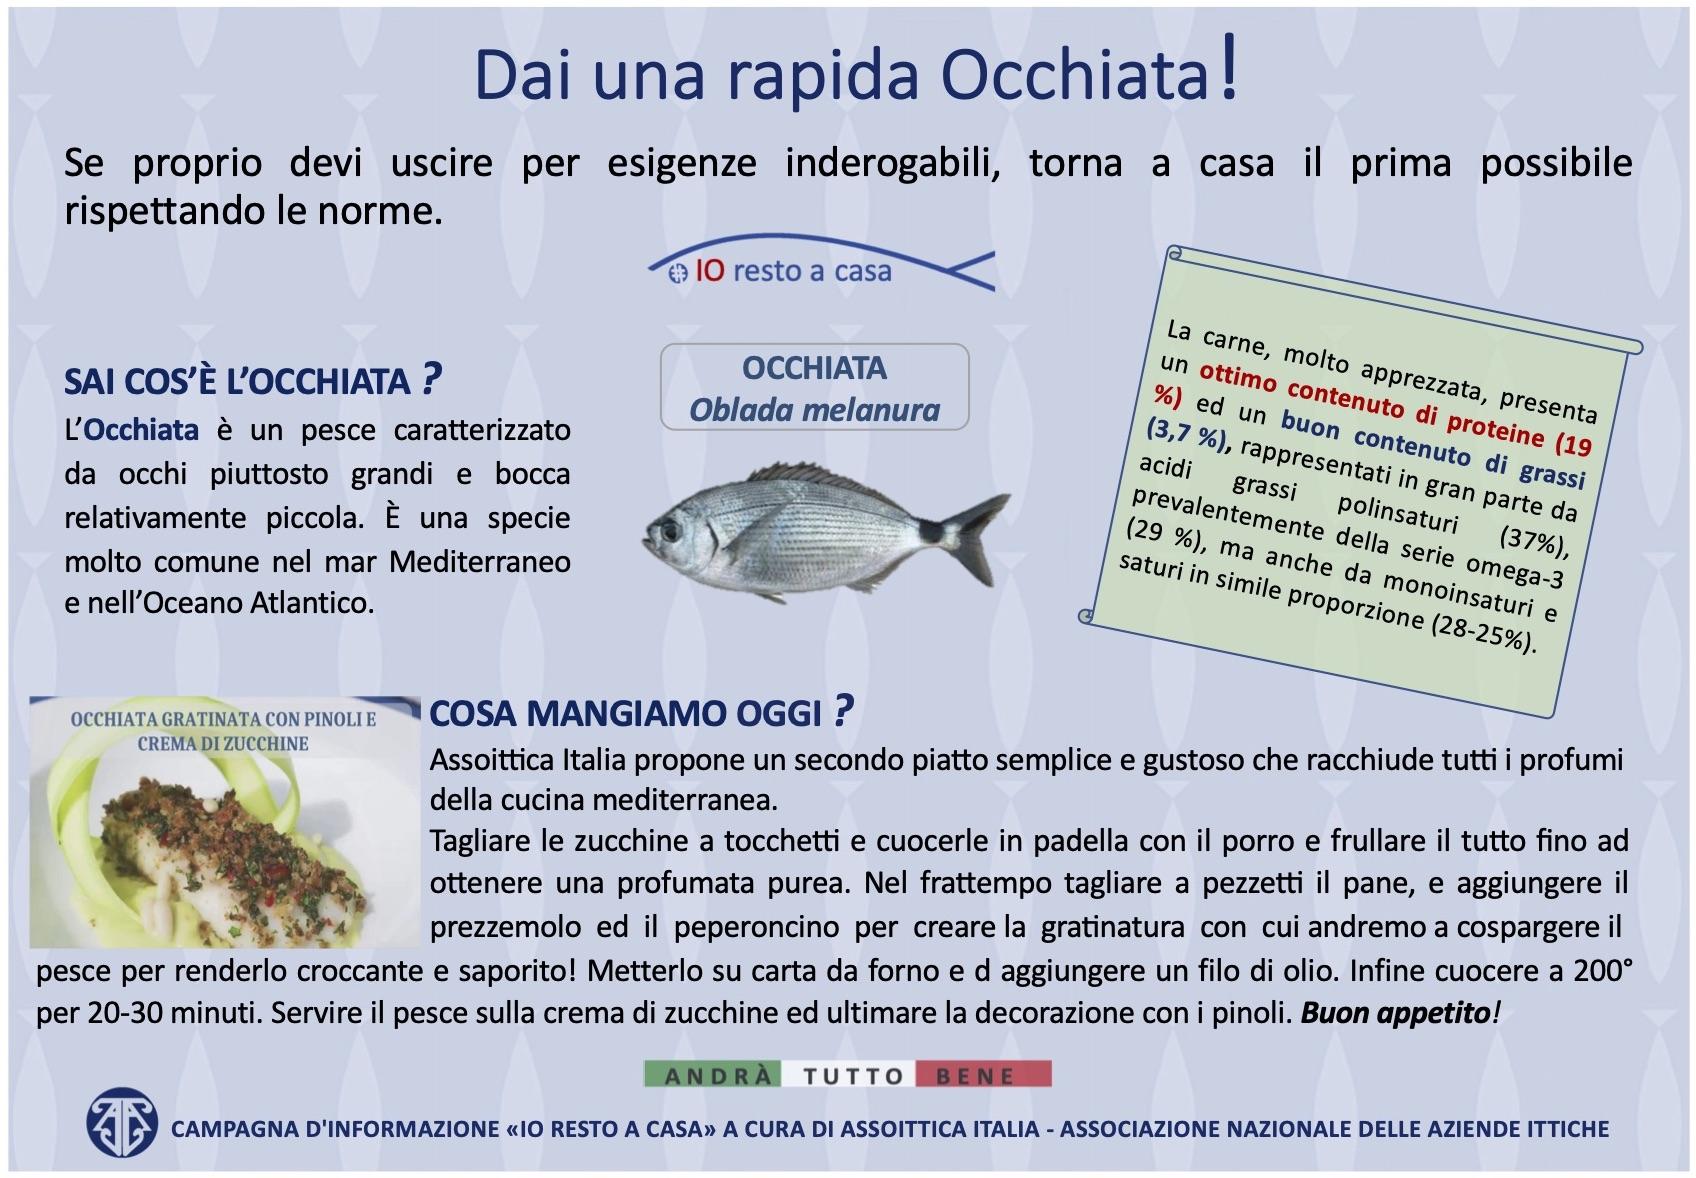 2 Camapagna Assoittica per Coronavirus Occhiata